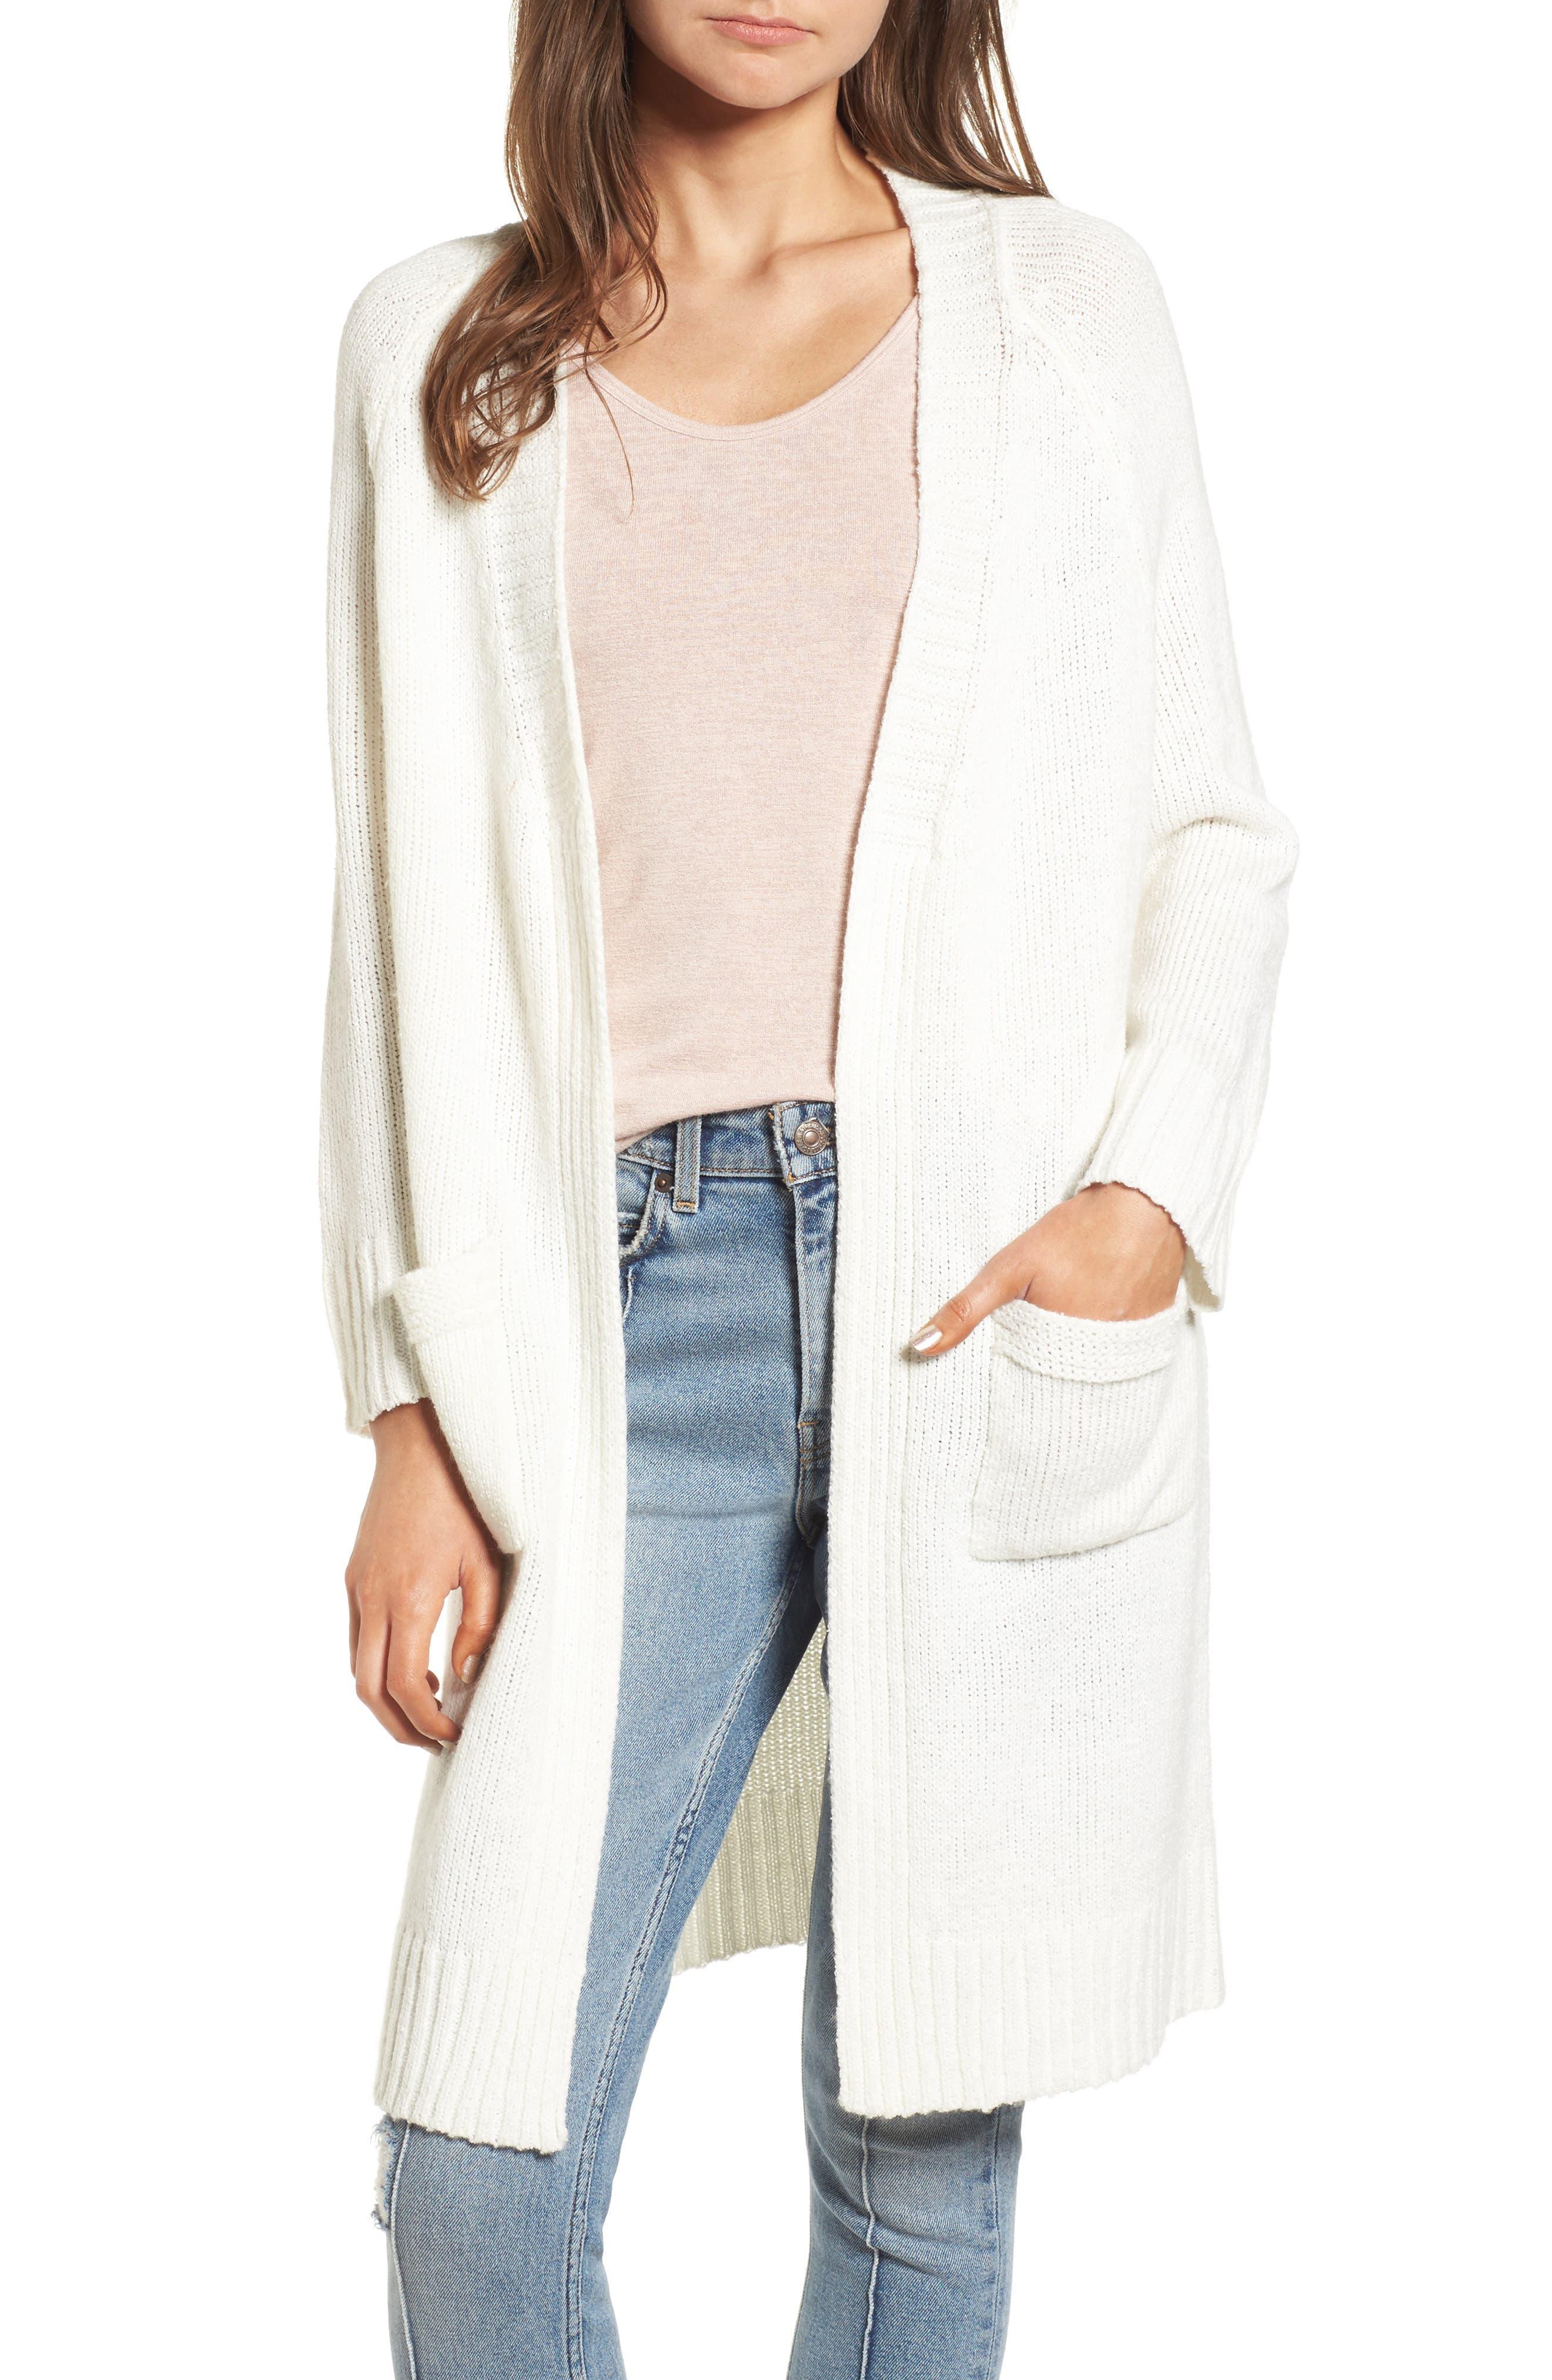 Blanco Open Cardigan,                         Main,                         color, White